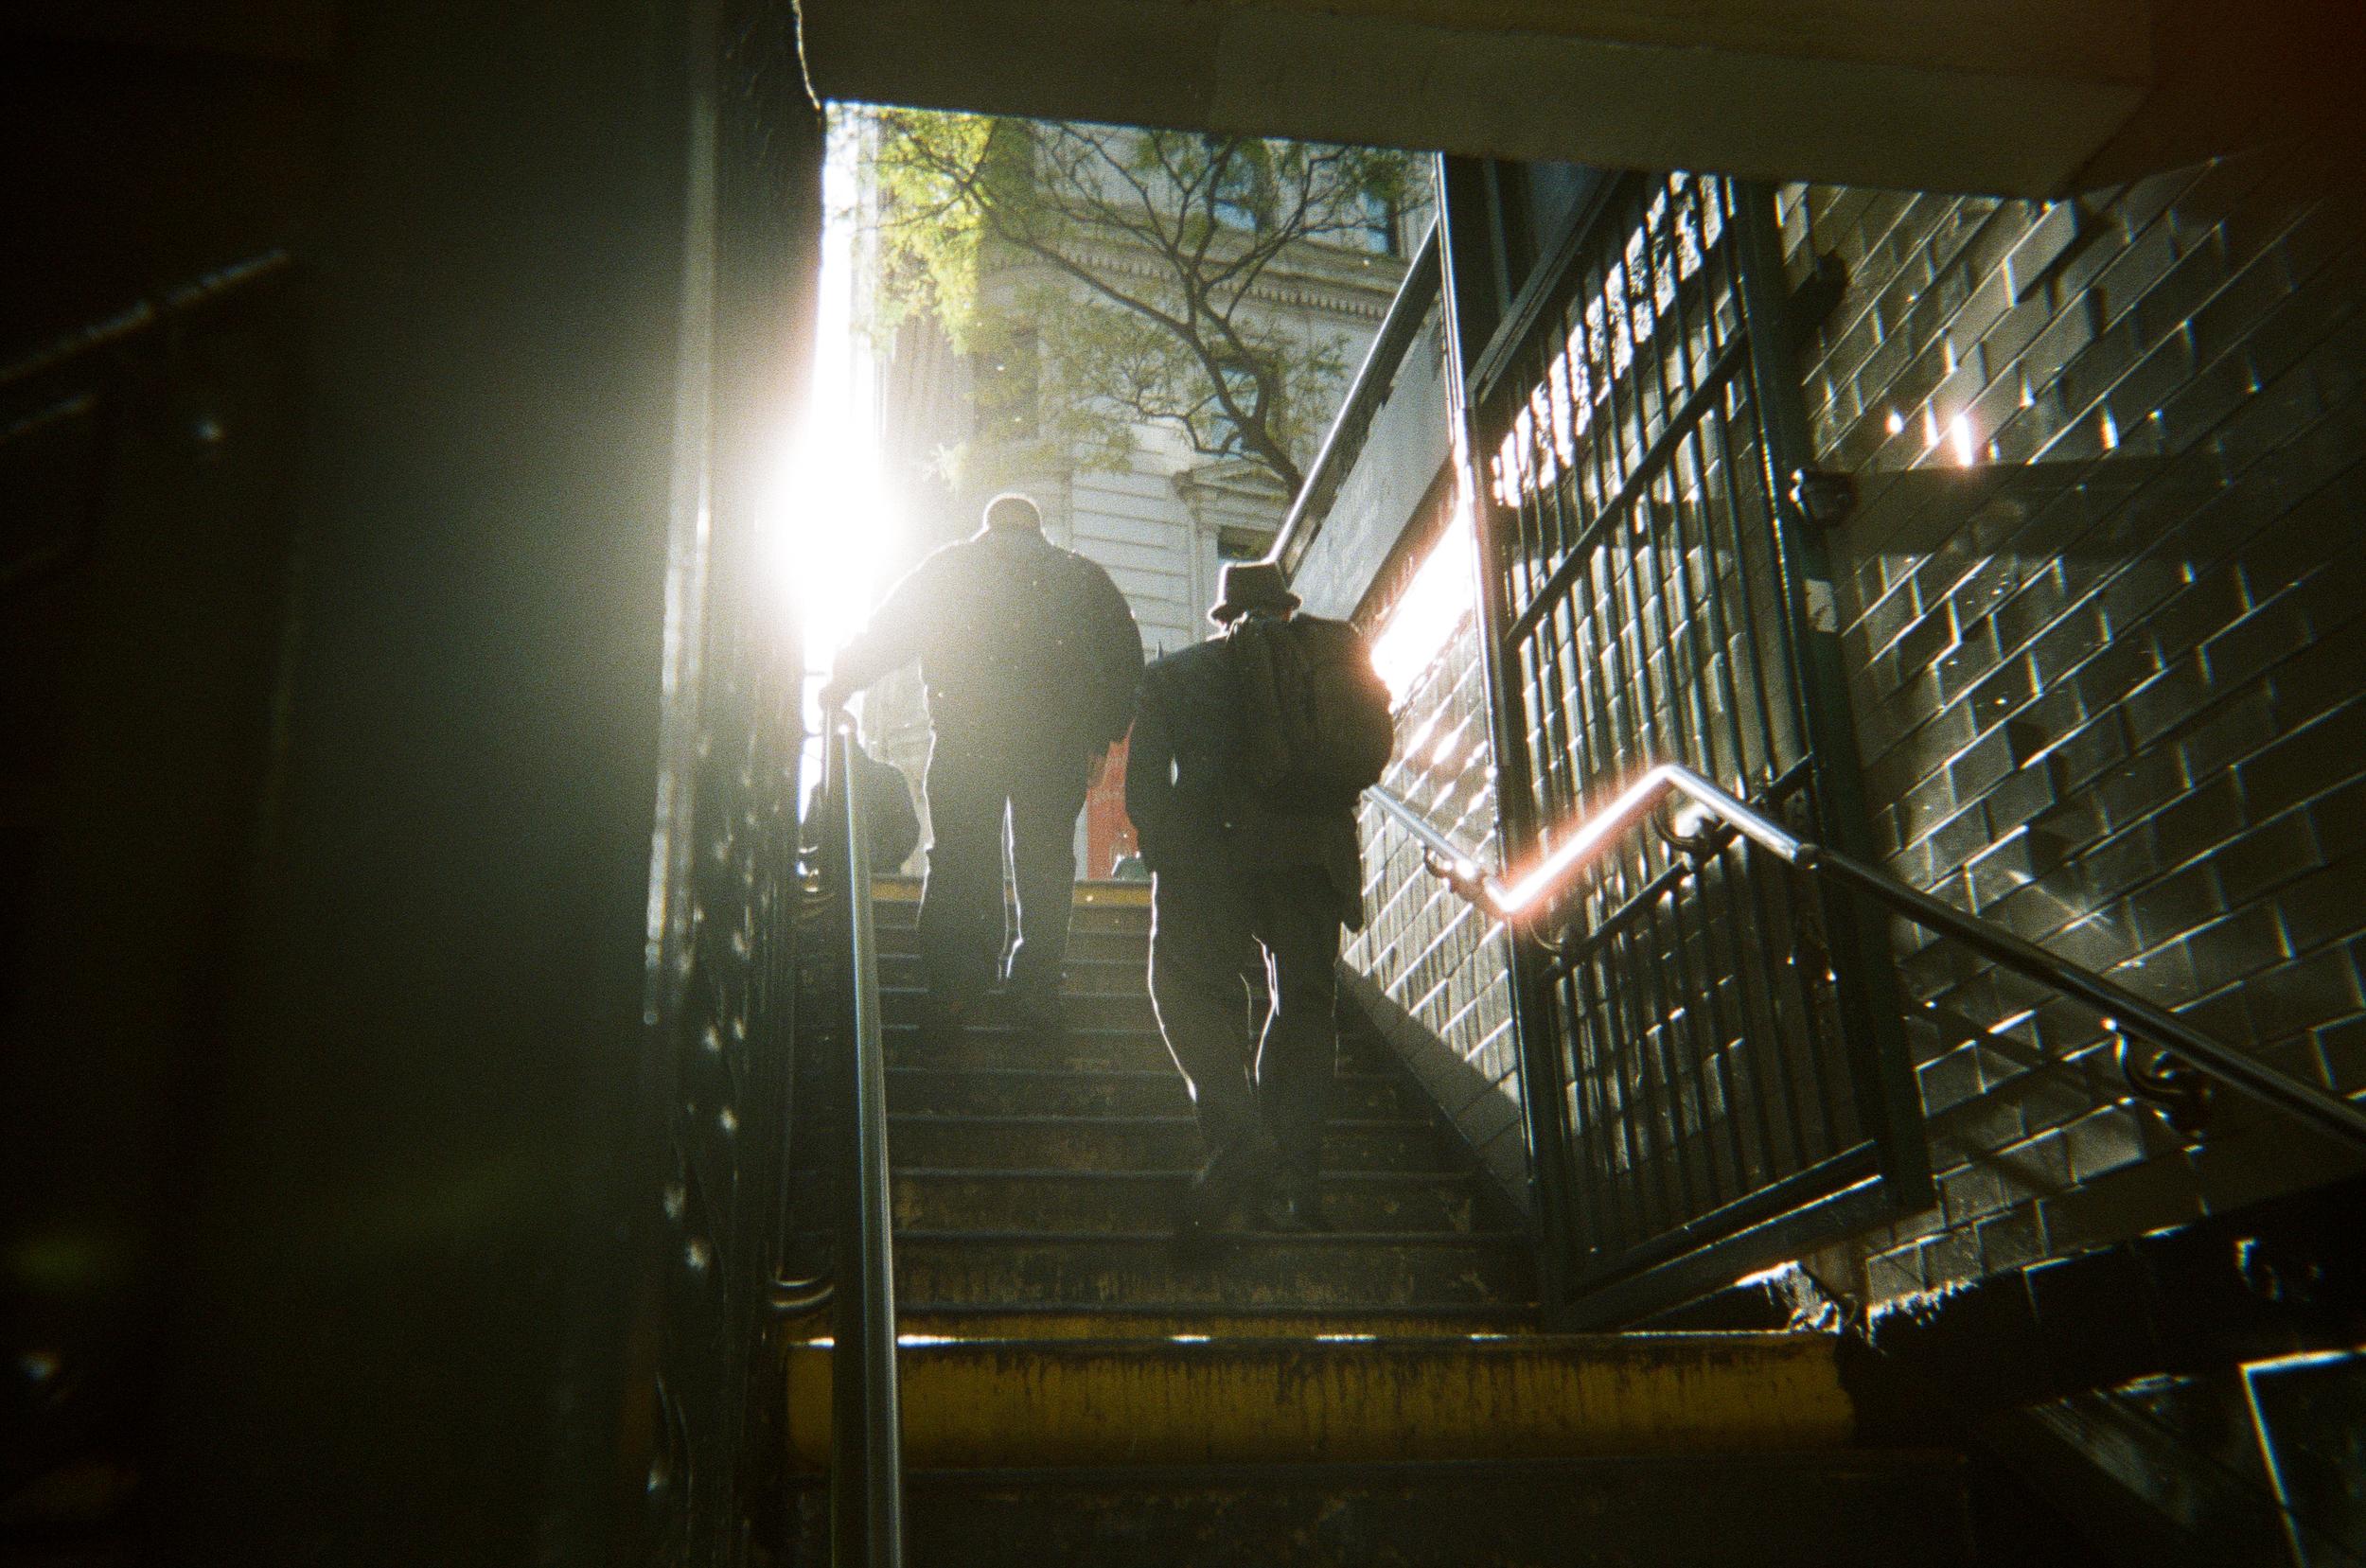 manhatten_wall_street_men_subway_lauren_ashmore